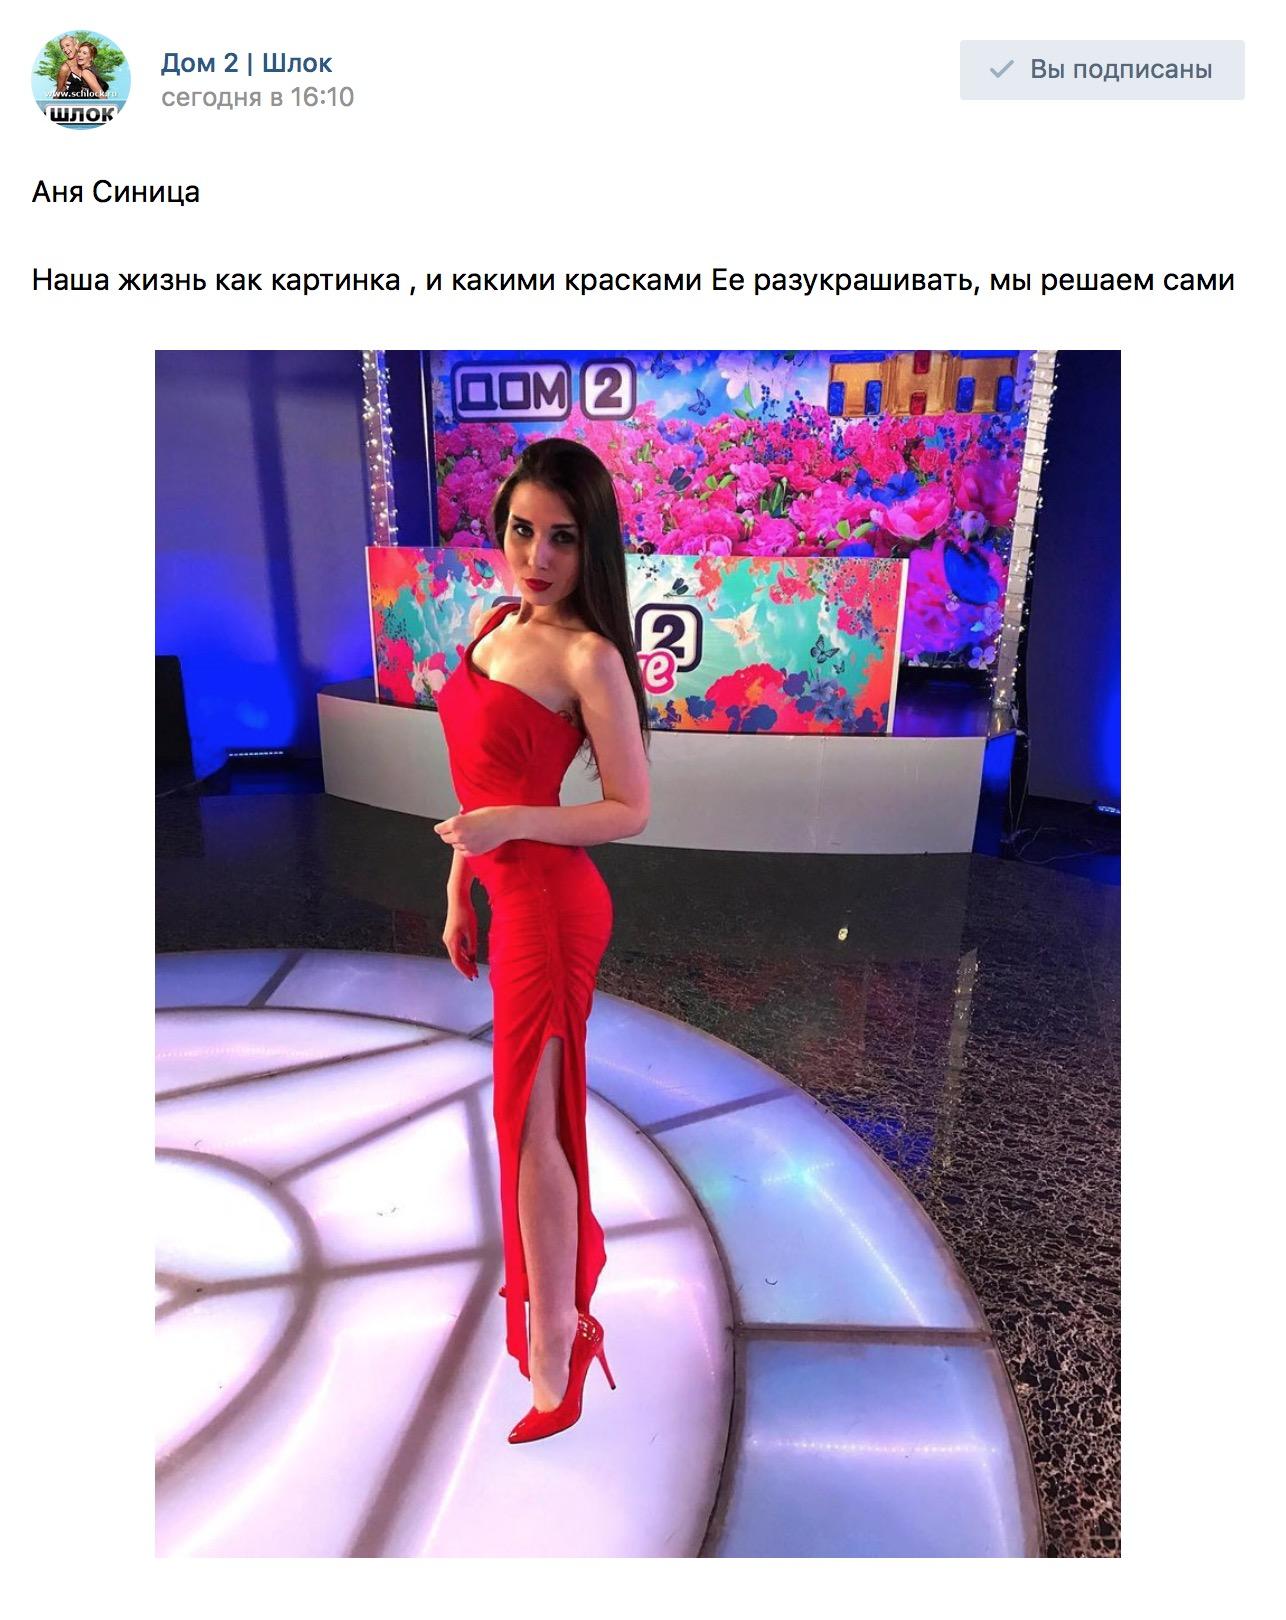 Голая Оля Бузова хакерские фото Видно её сиськи киску и